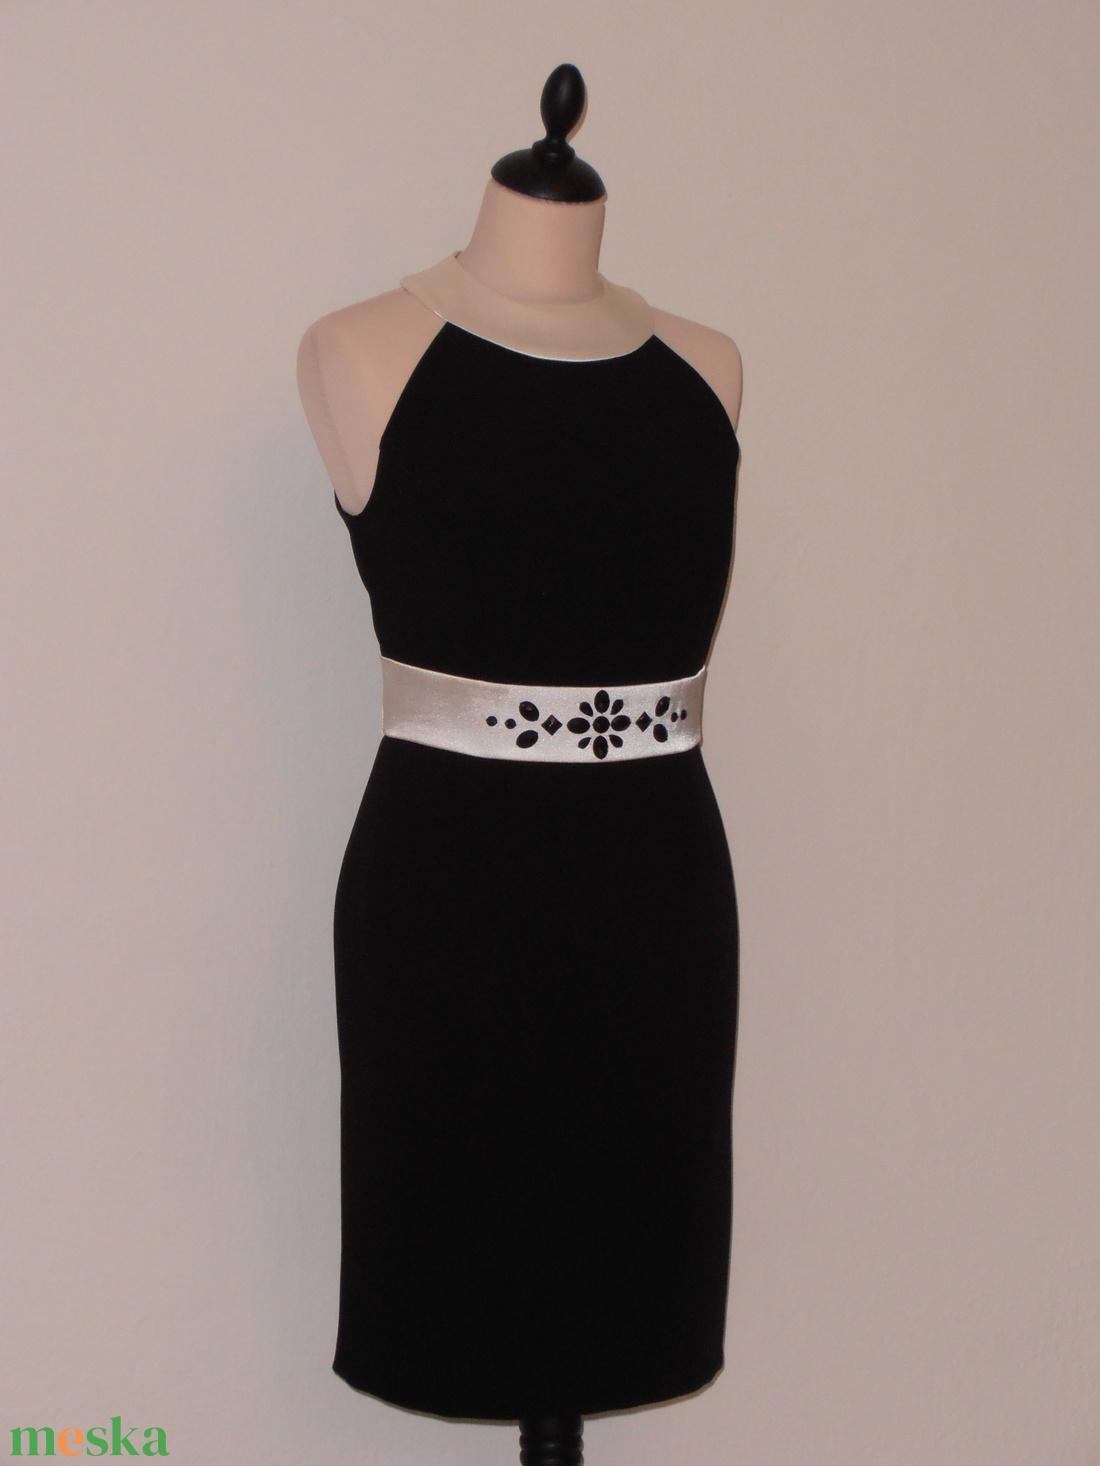 ... Ekrű-fekete alkalmi ruha boleróval (nicoledesign) - Meska.hu ... f8a4a48cf5